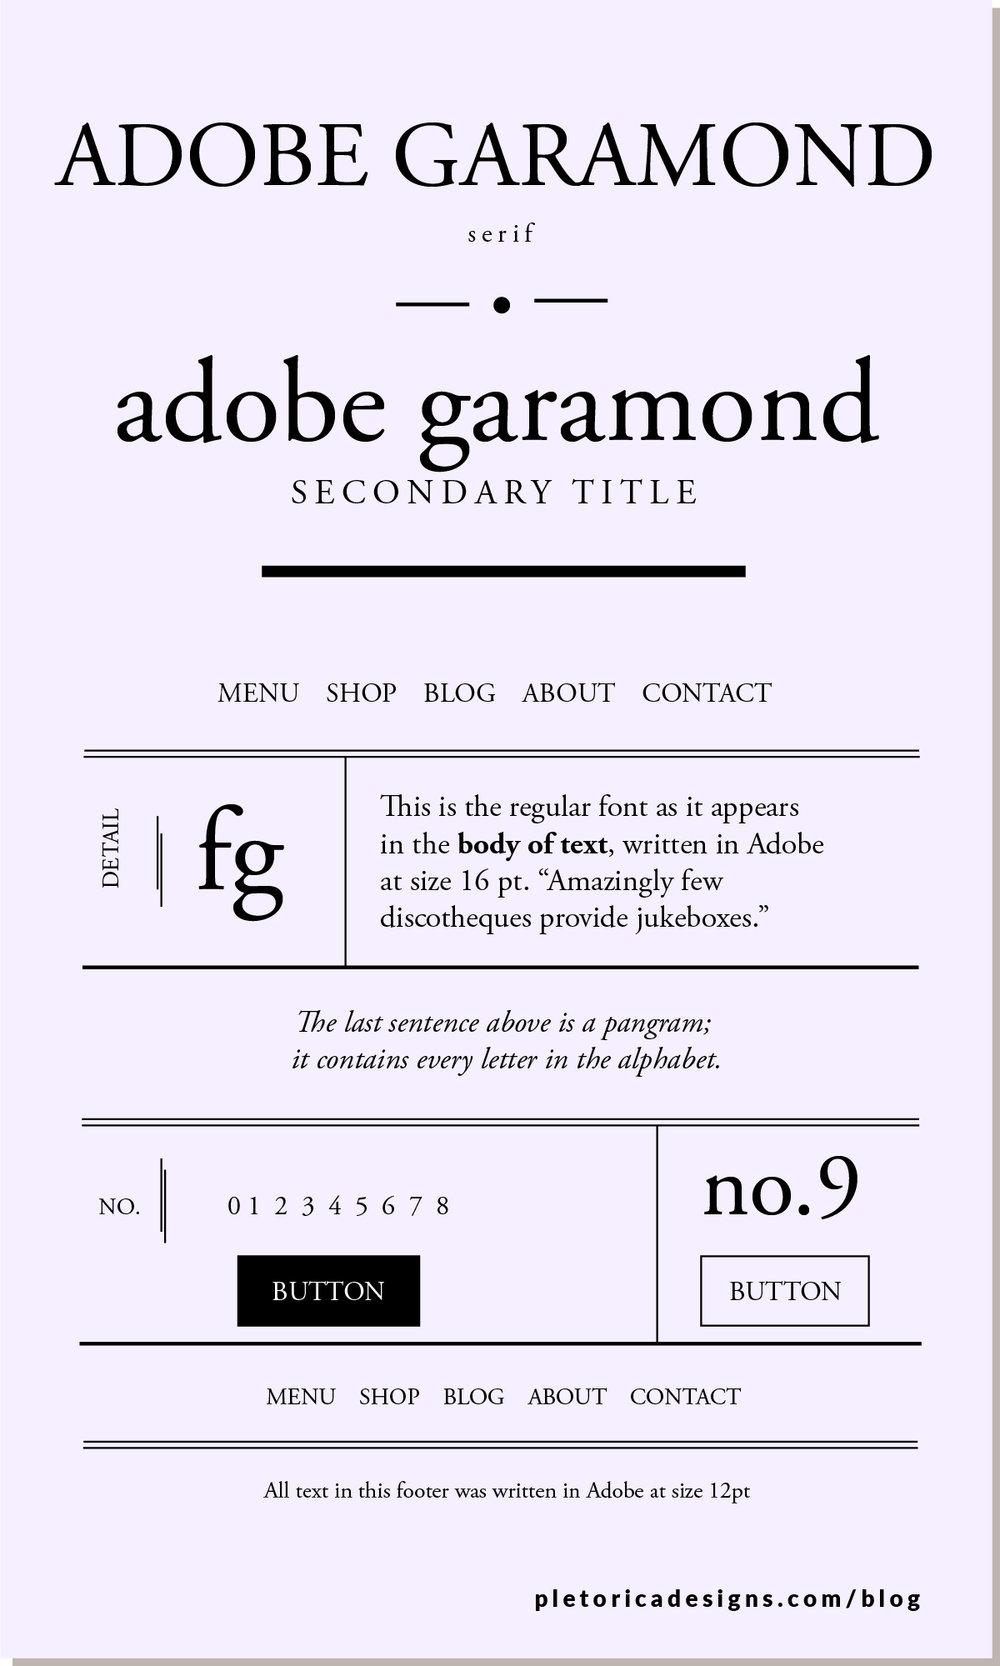 POSTER_AdobeGaramond.jpg